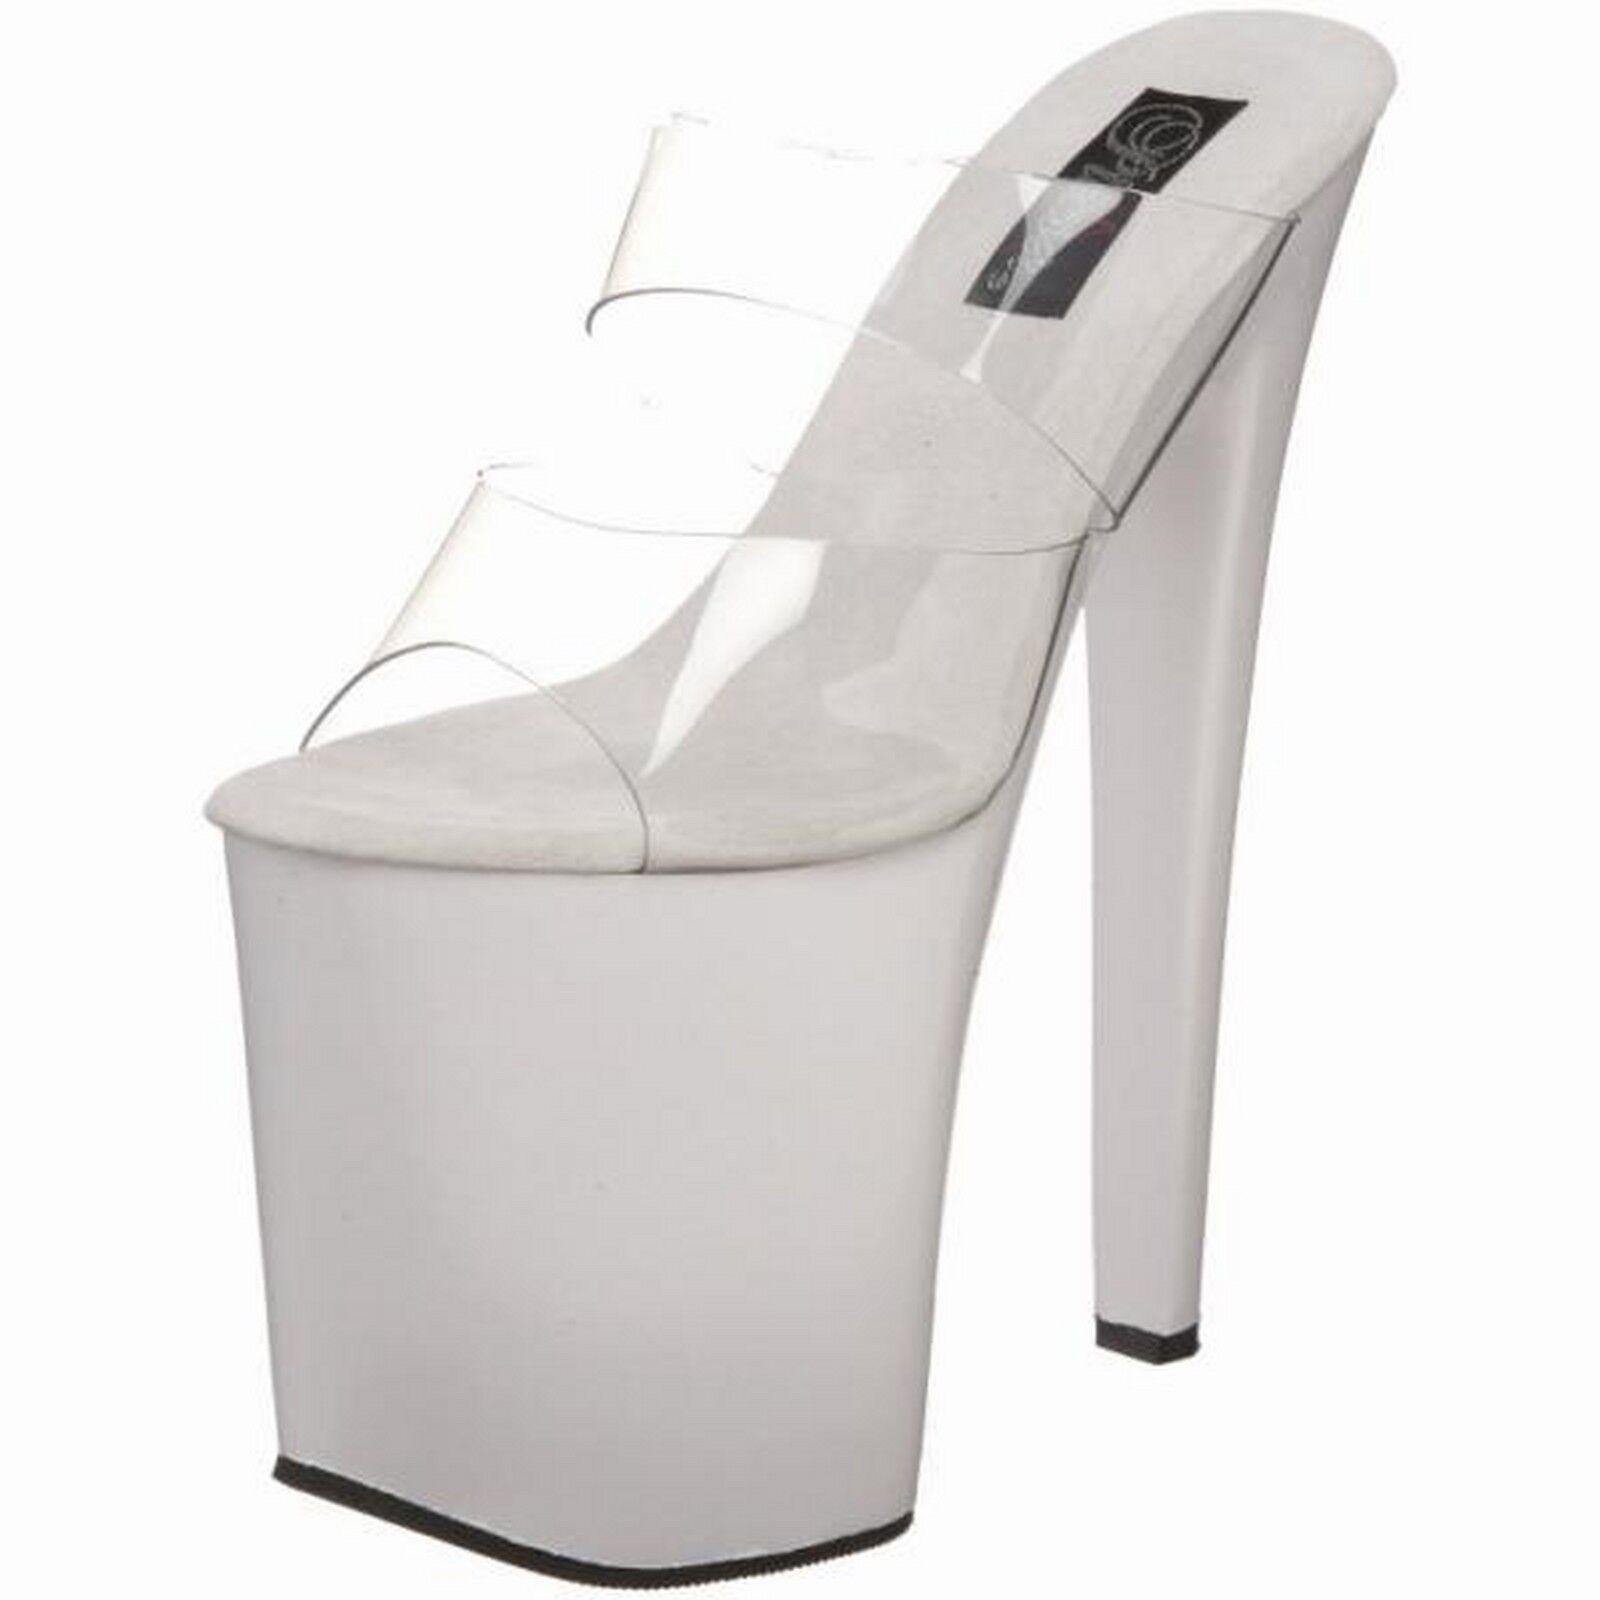 PLEASER Platform Shoes High Heels Clear Upper Stripper Sandal XTREME-802 bianca